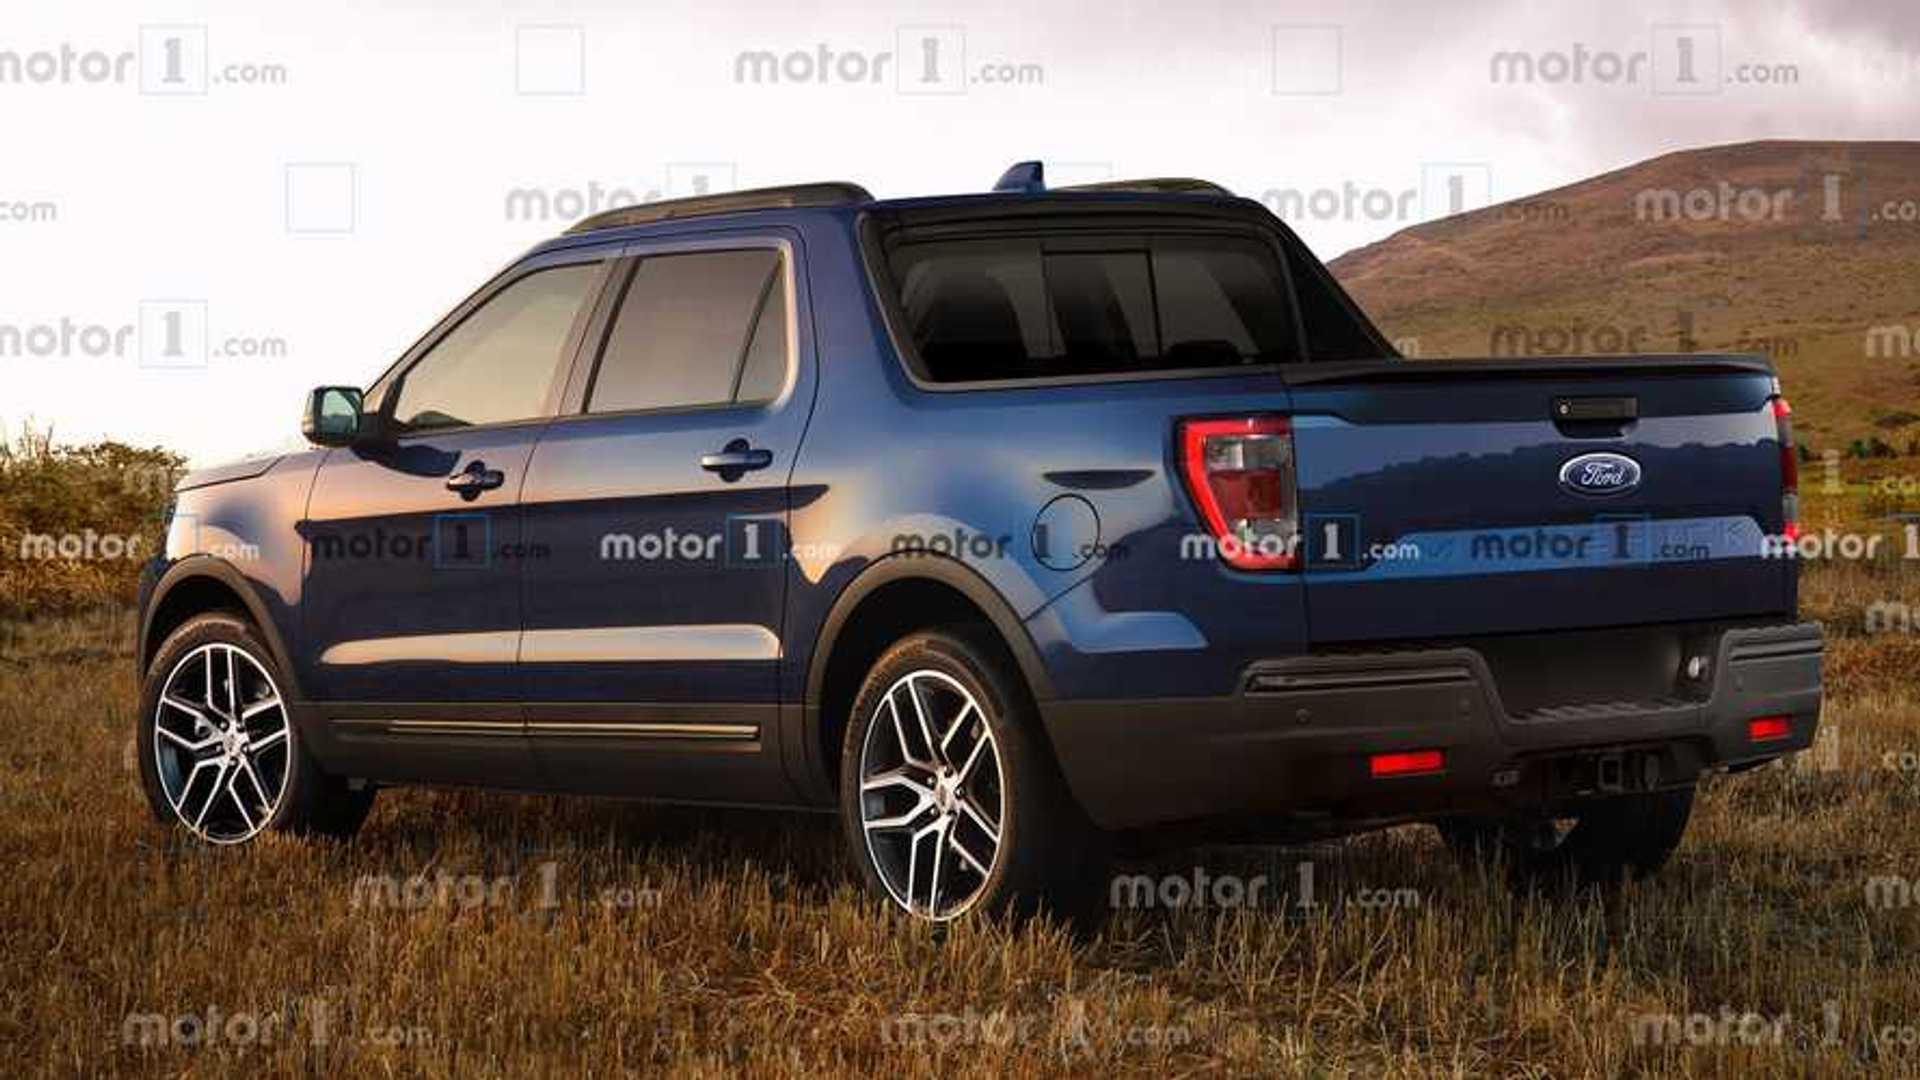 2020 - [Ford] Pickup  Ford-maverick-renderings-rear-3-4